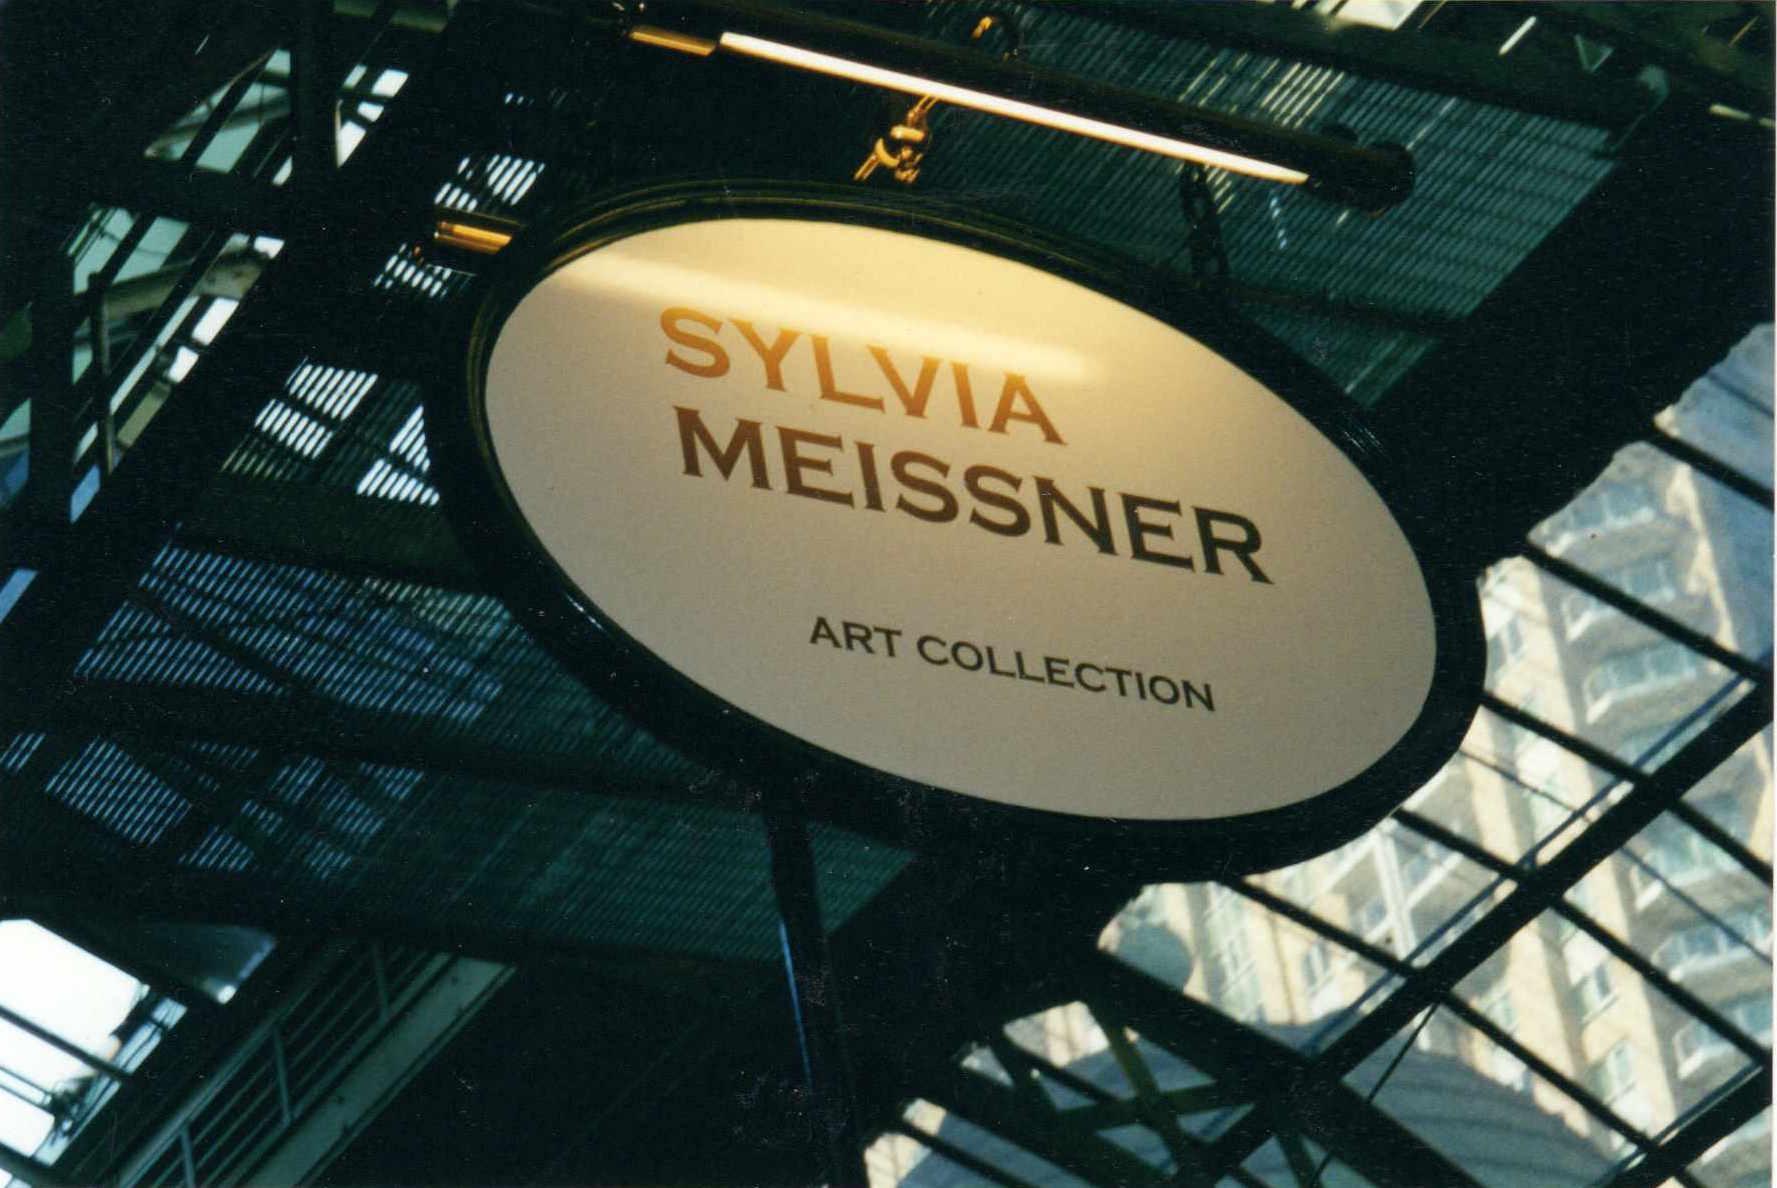 Sylvia Meissner QVB